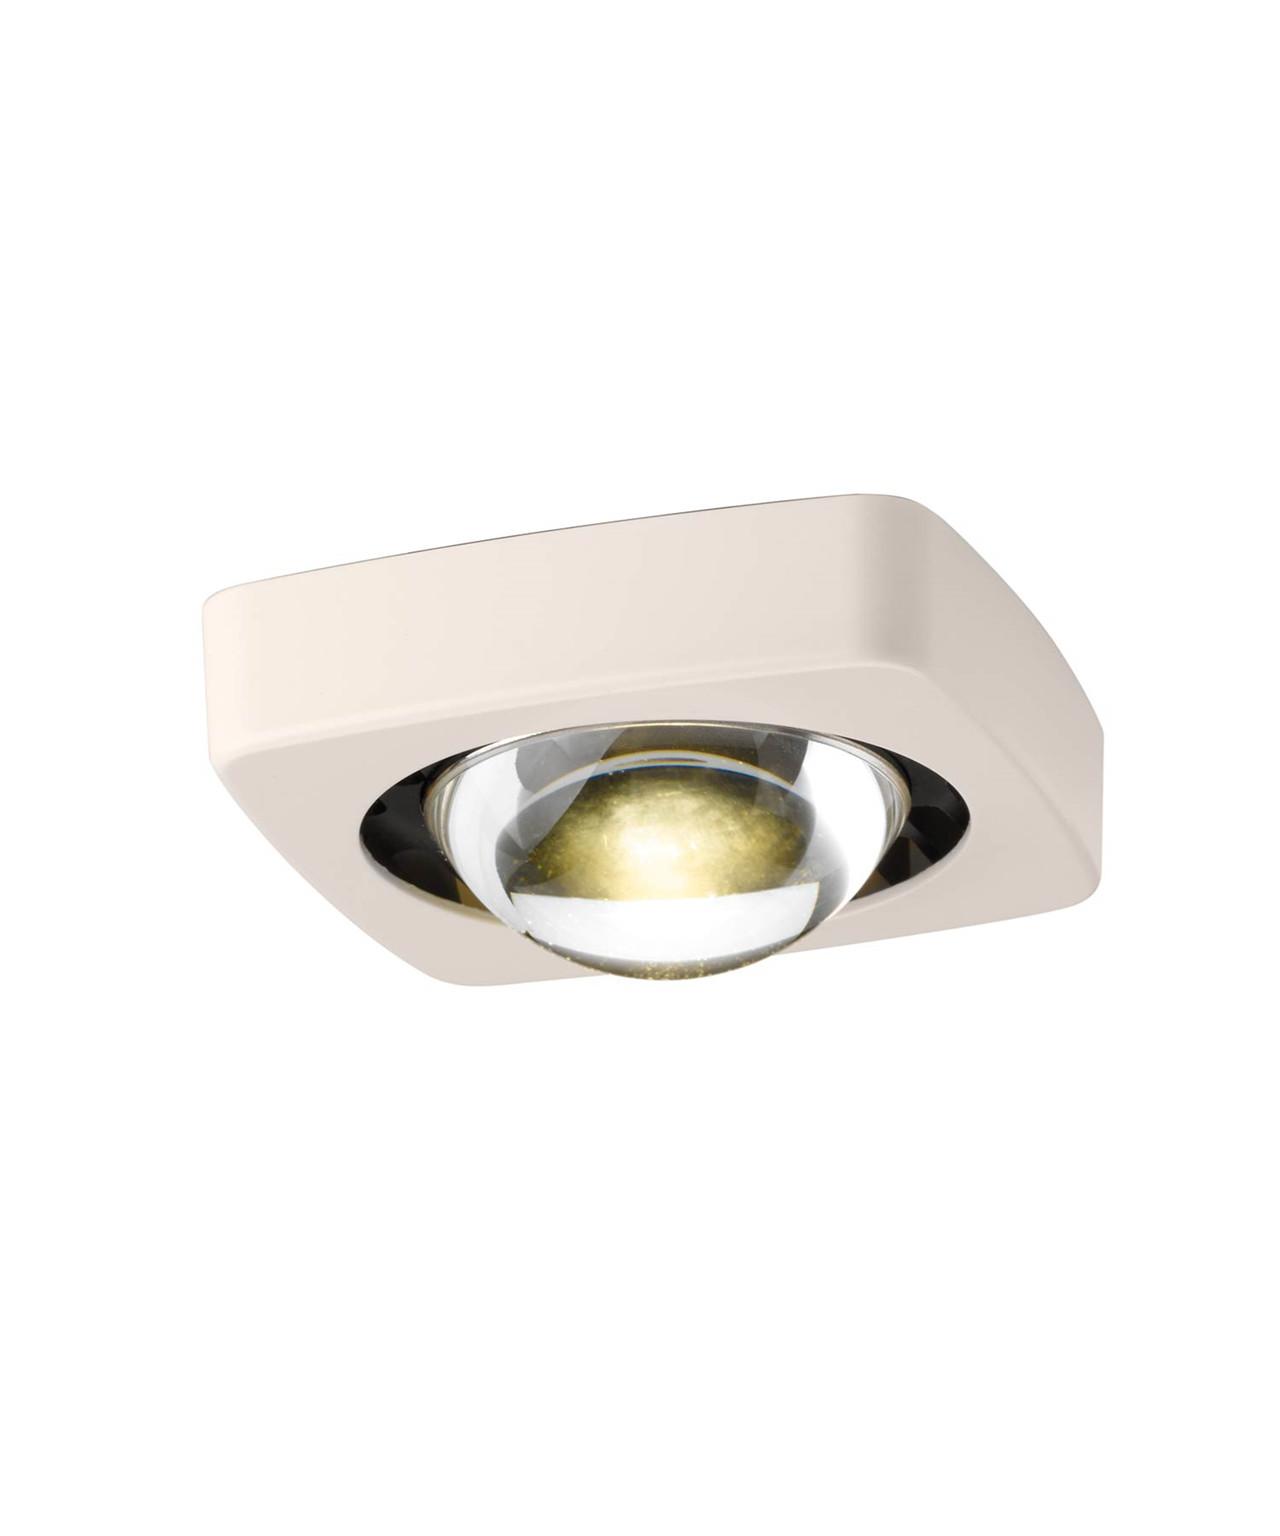 Oligo – Kelveen loftlampe/væglampe monted 90? - oliga på lampemesteren.dk